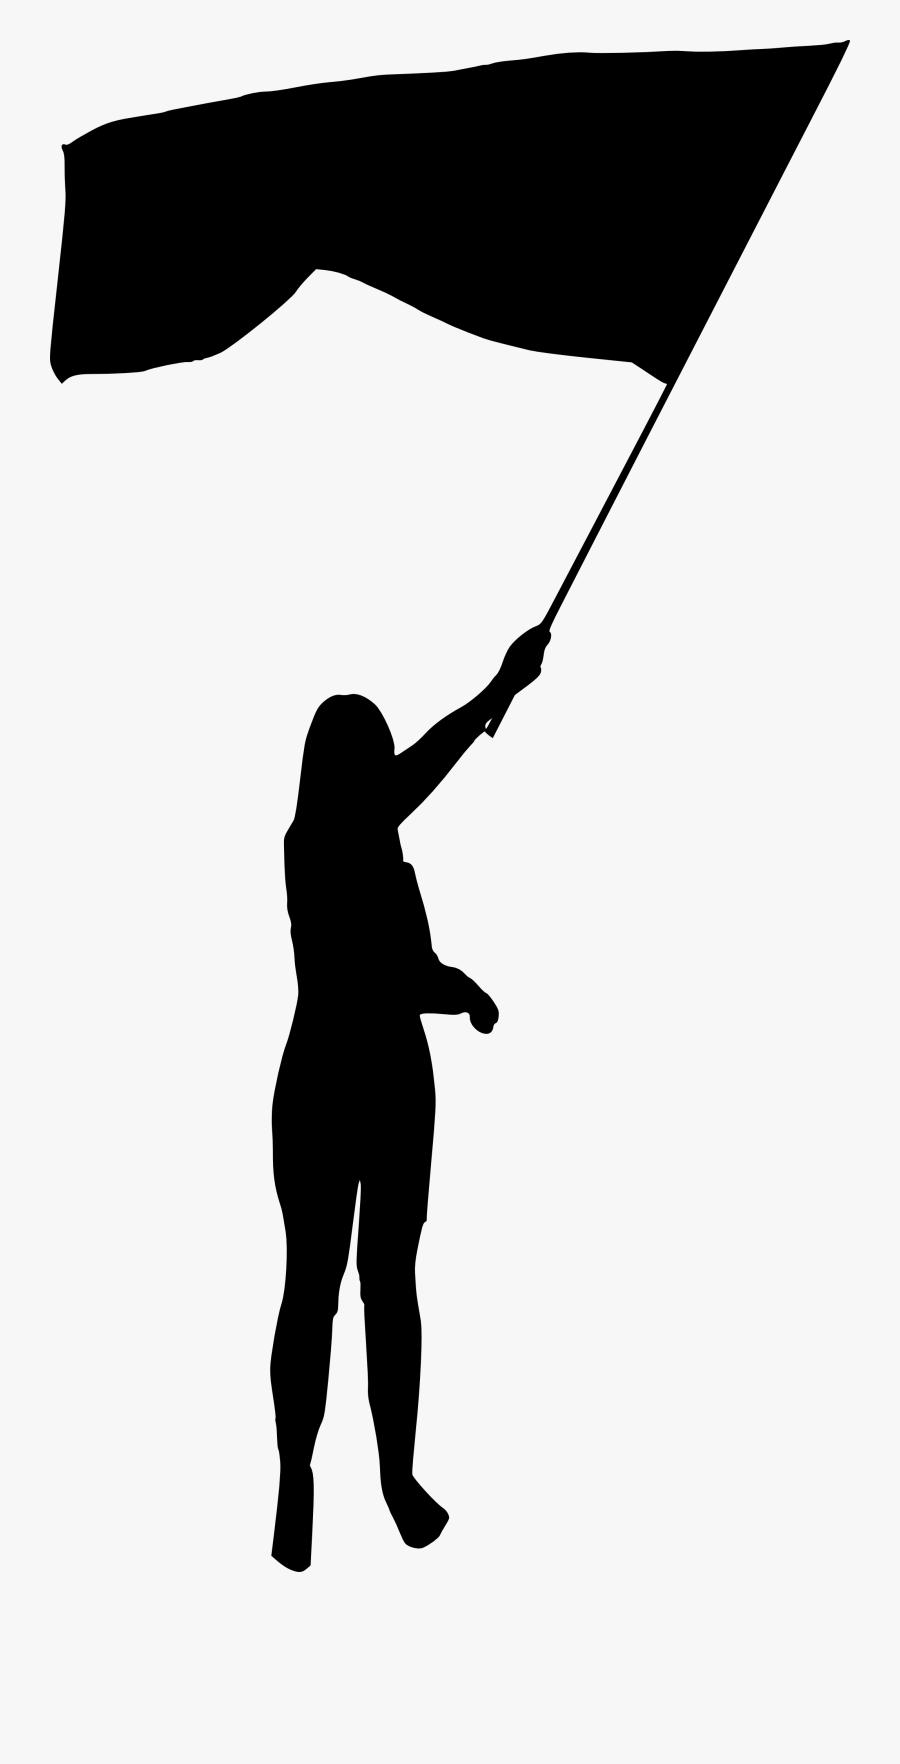 Transparent Nadar Clipart - Woman Holding Flag Silhouette, Transparent Clipart